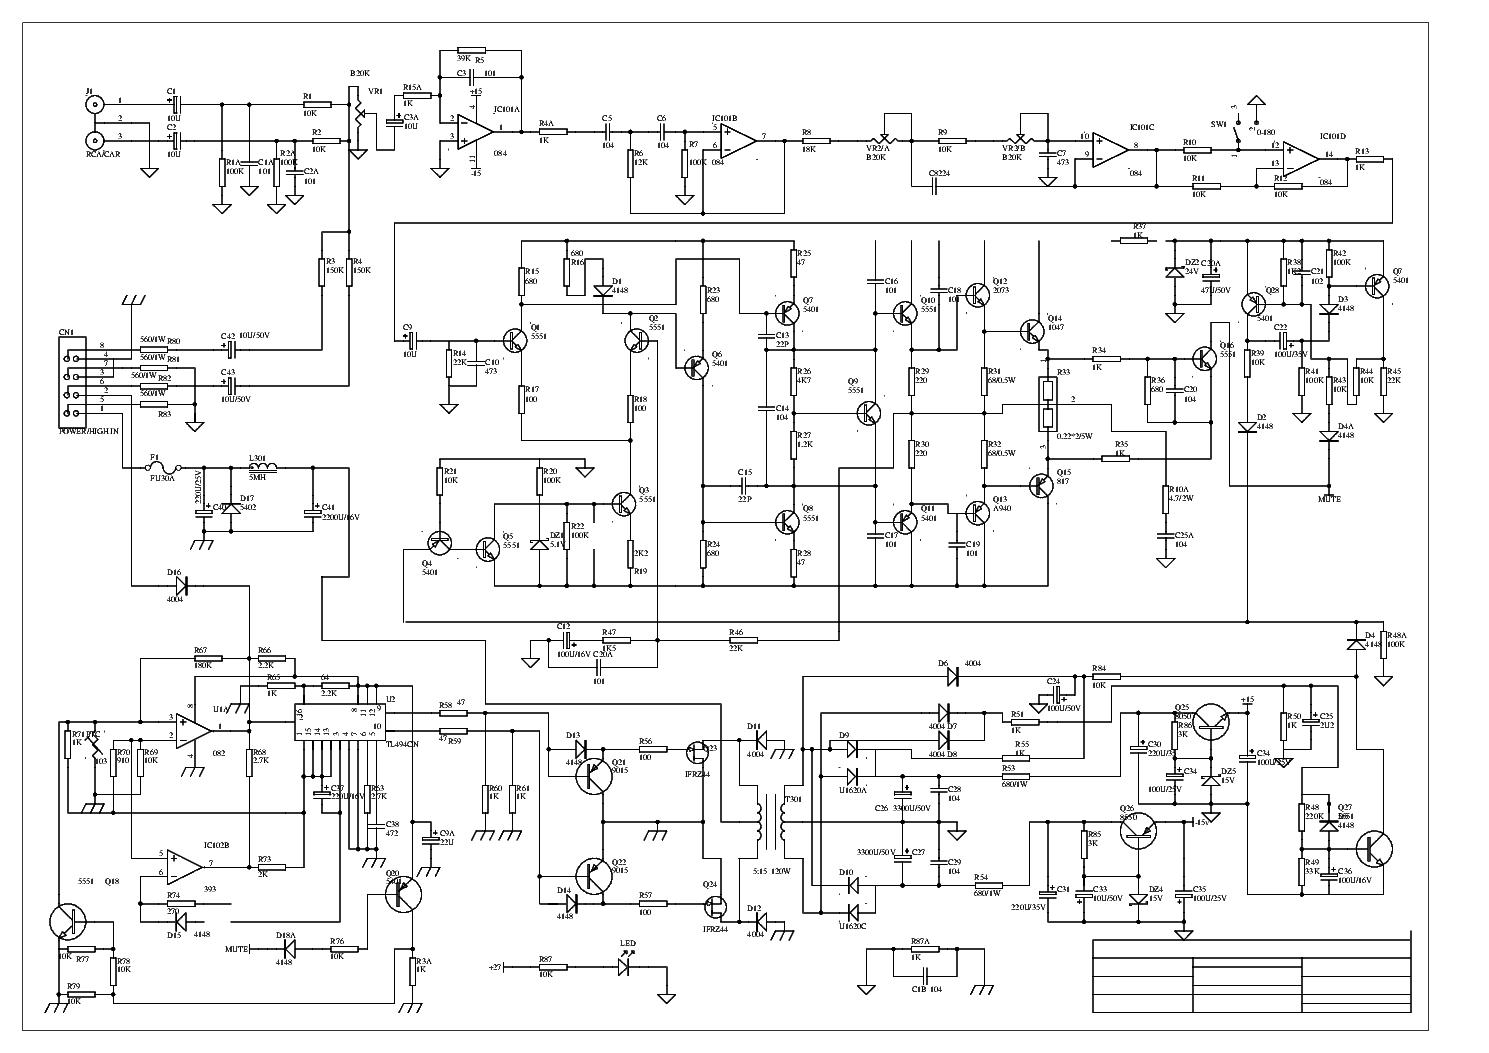 hyundai h-csbx8a инструкция